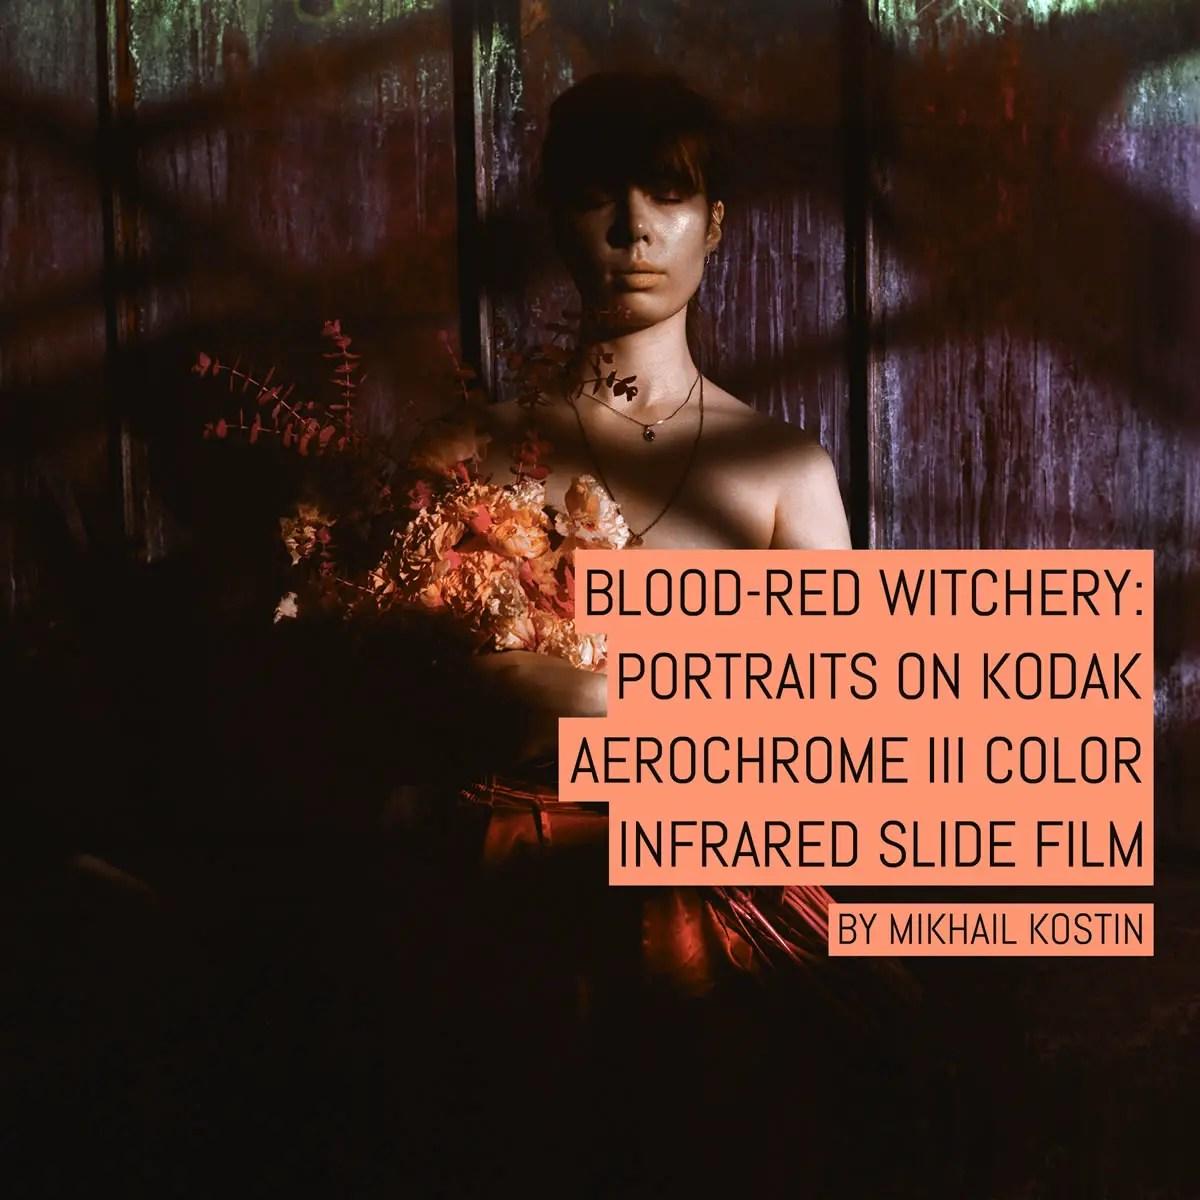 Blood-red Witchery: Portraits on Kodak AEROCHROME III color infrared slide film